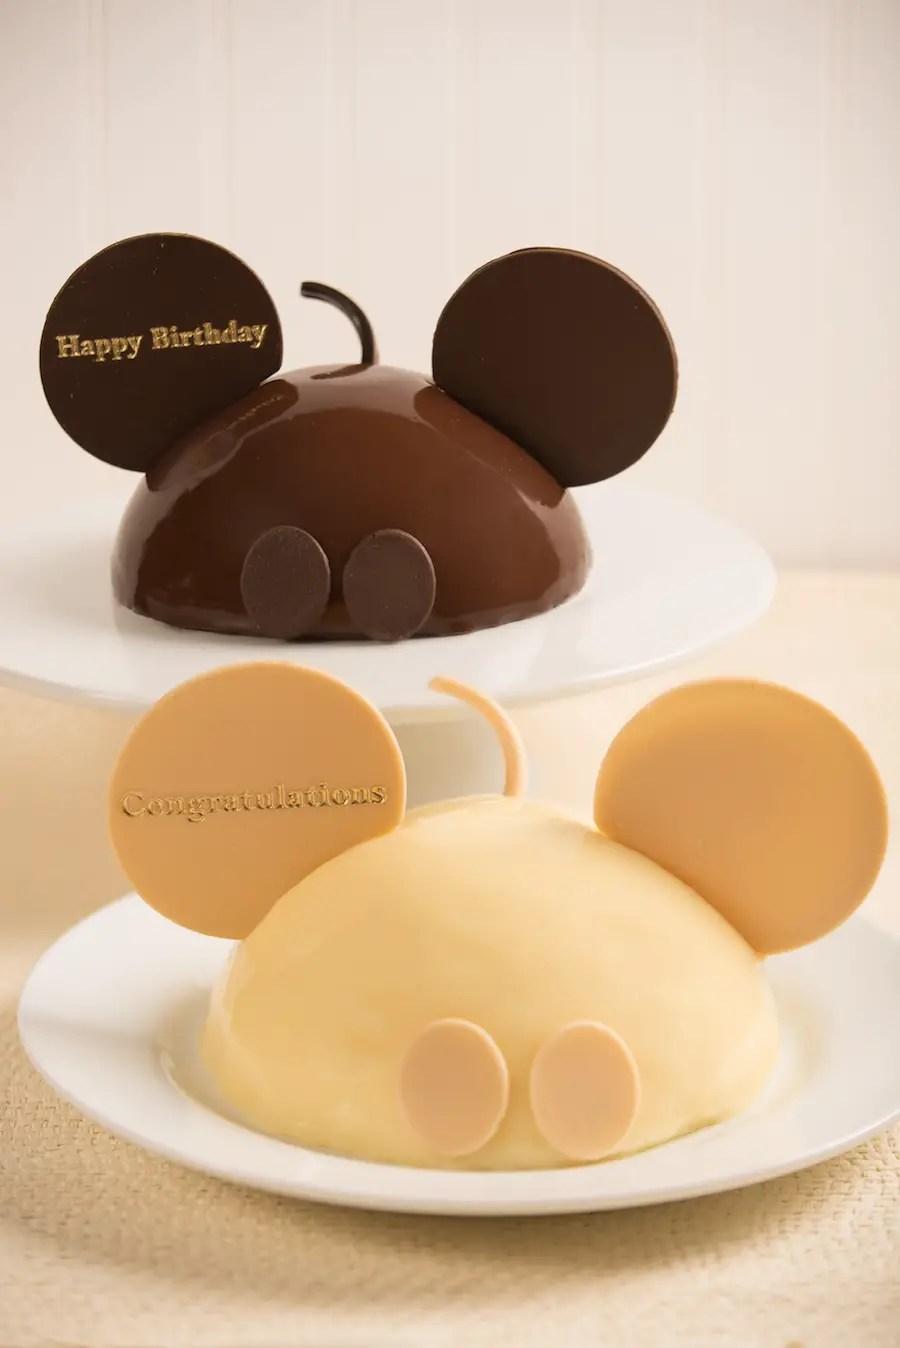 New Celebration Cakes Coming to Walt Disney World